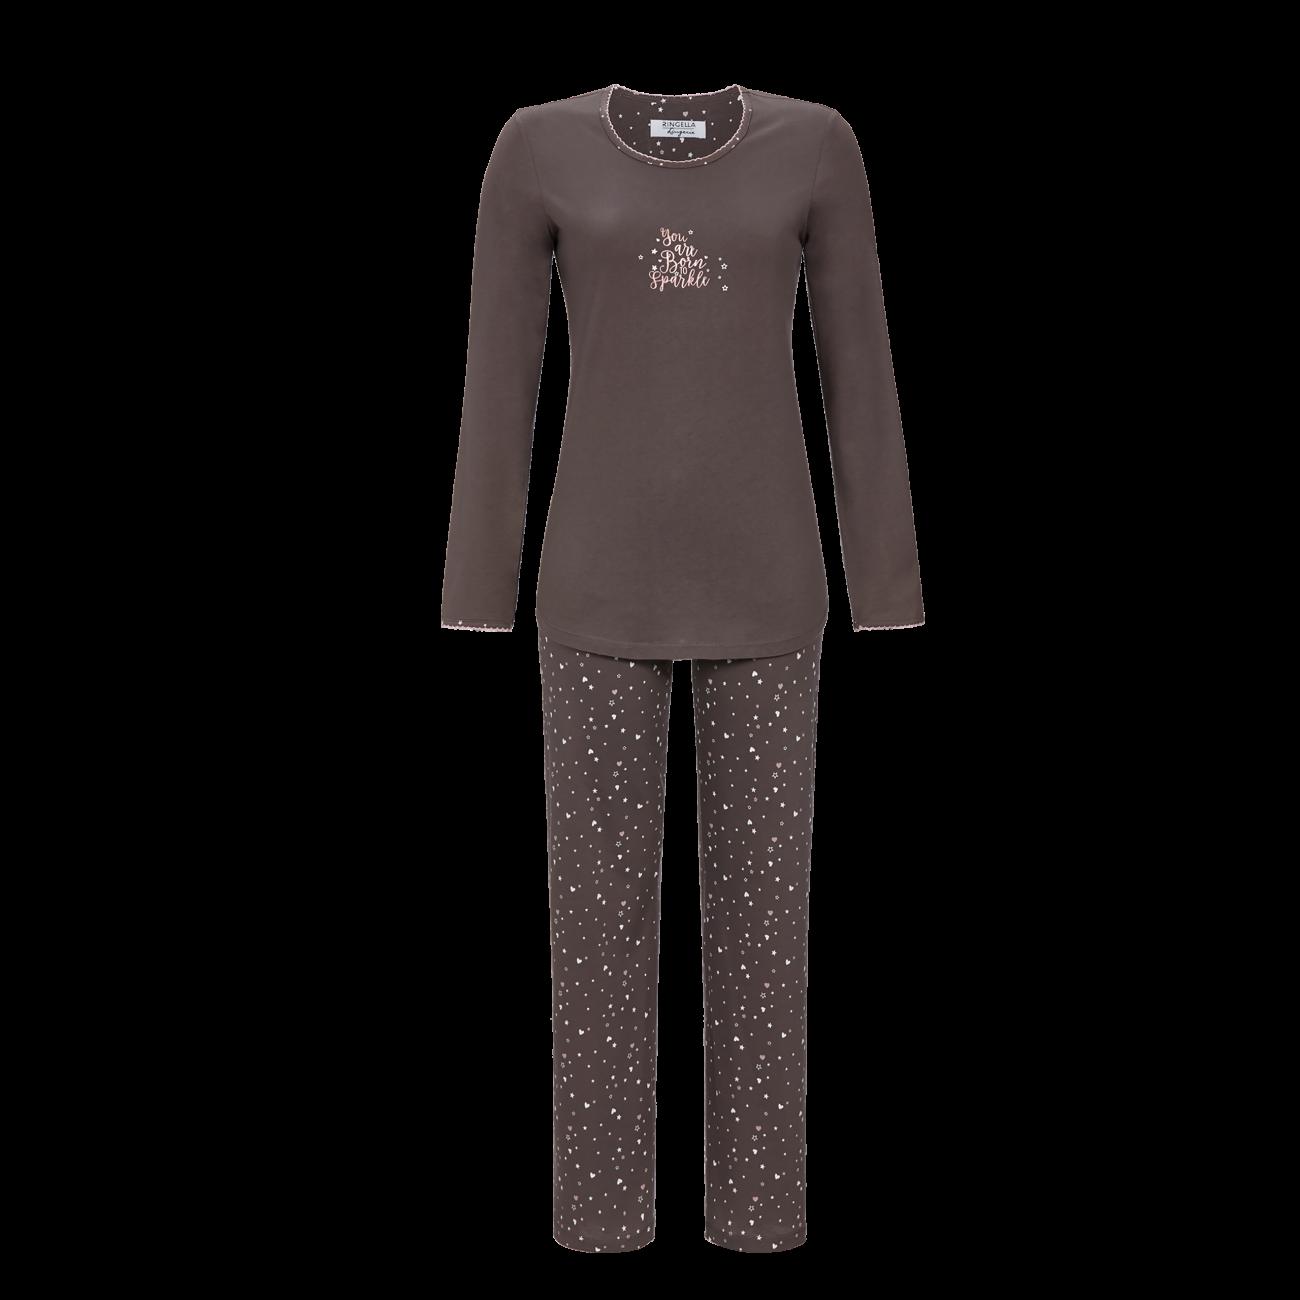 Pyjama mit Motivdruck charcoal grey | 36